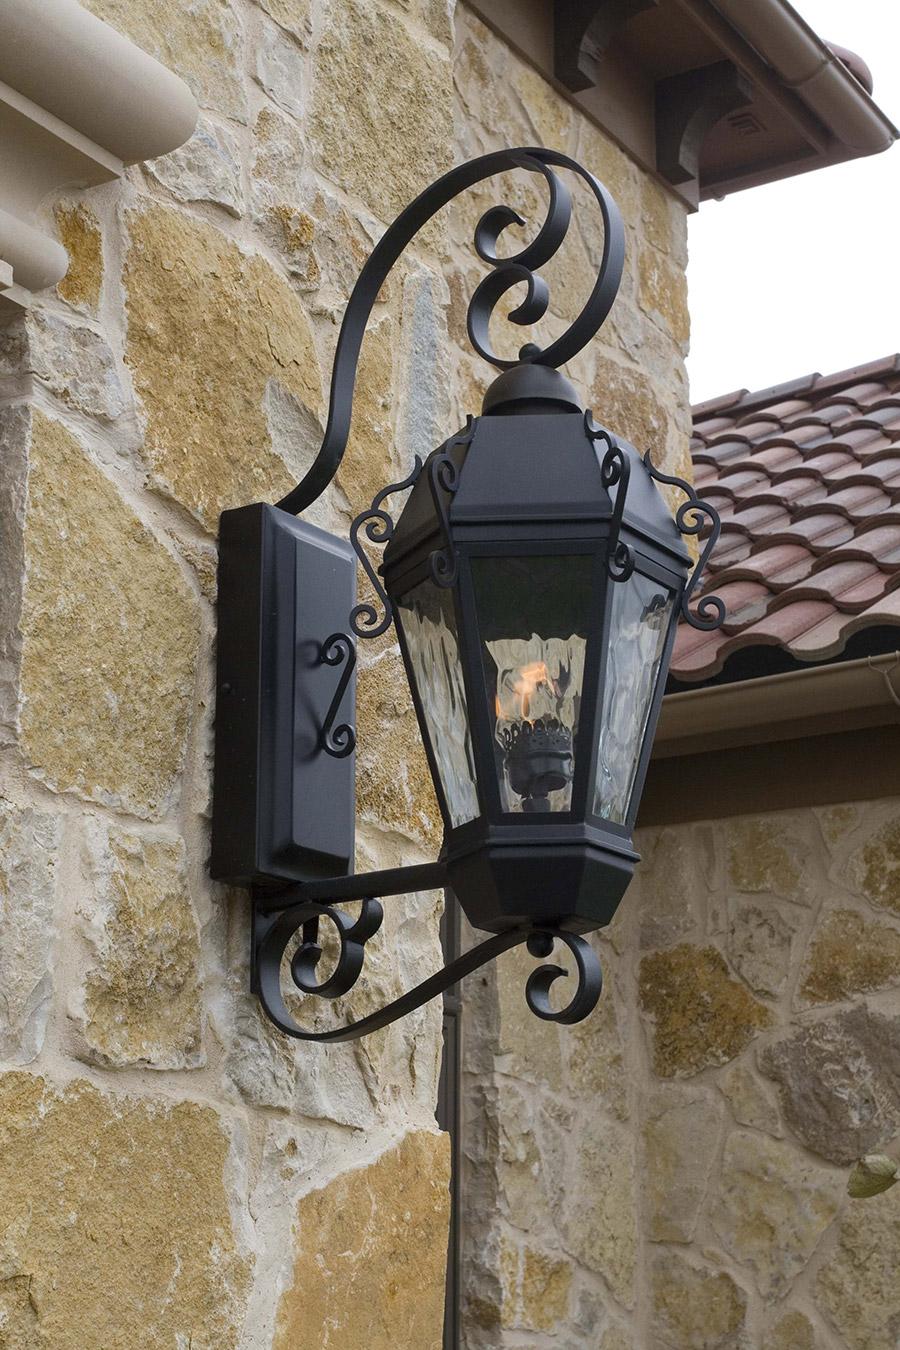 Vienna-iron-lighting-fixture-foyer-hall-pendant-entry-kitchen-solara-ligthing-D006-012-EG--(5)